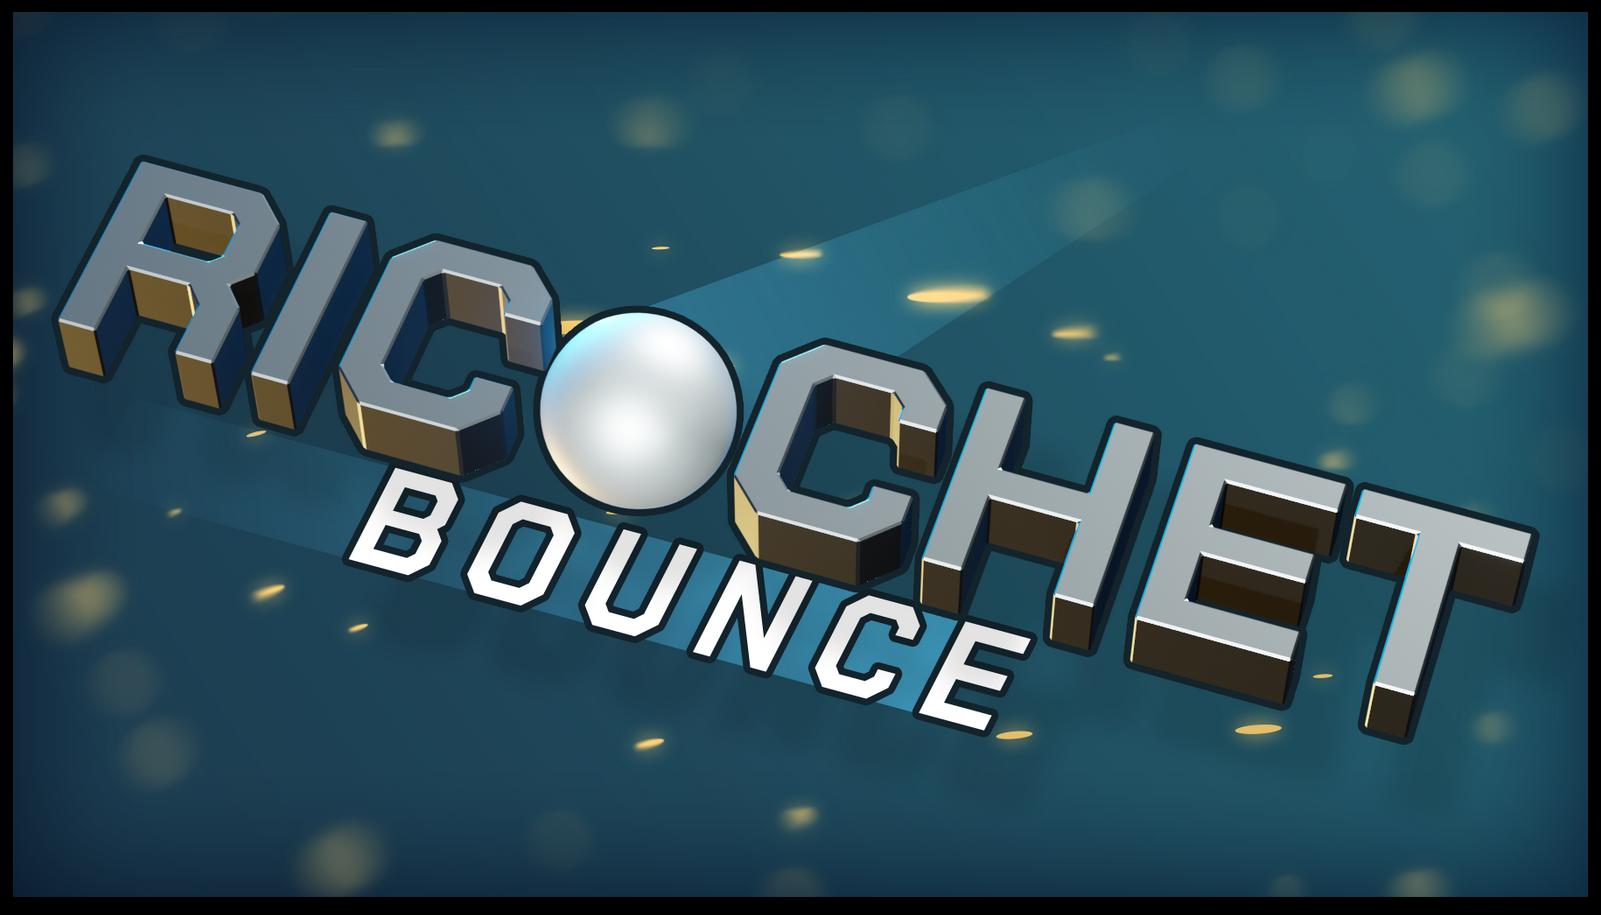 Videojuego Bounce ricochet